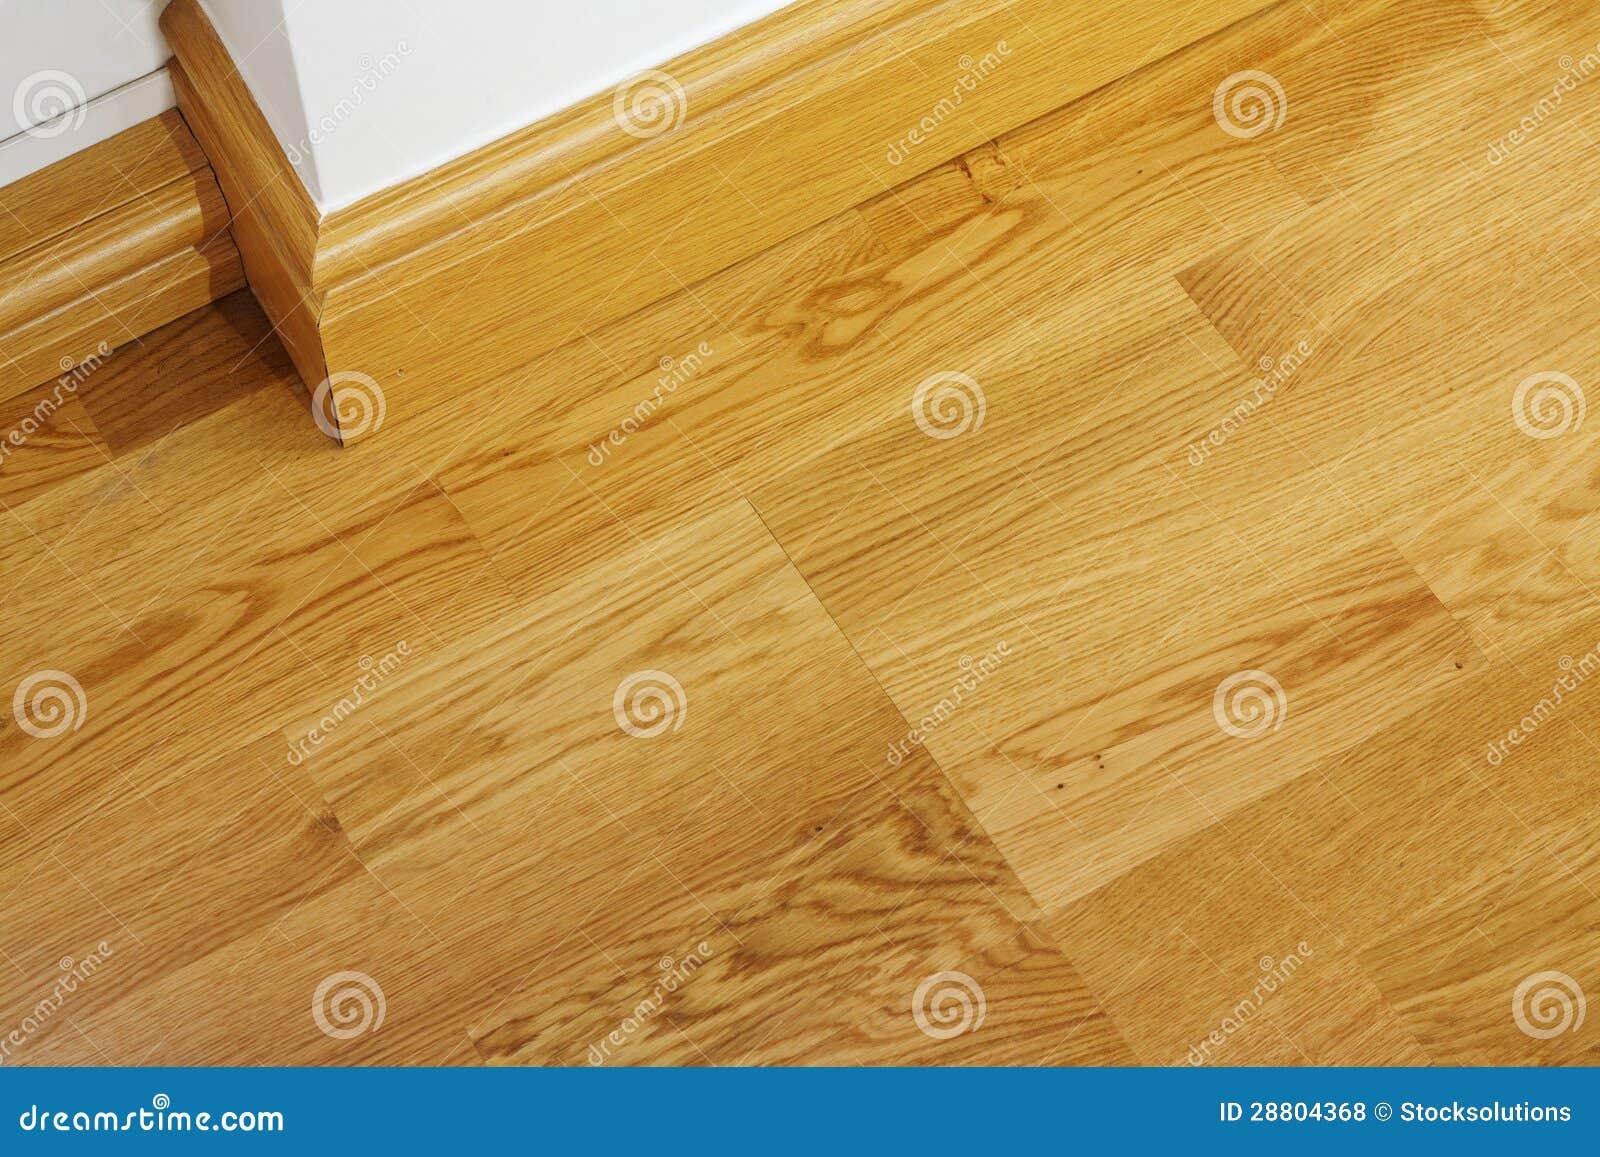 Laminate flooring skirting boards laminate flooring for Wood skirting